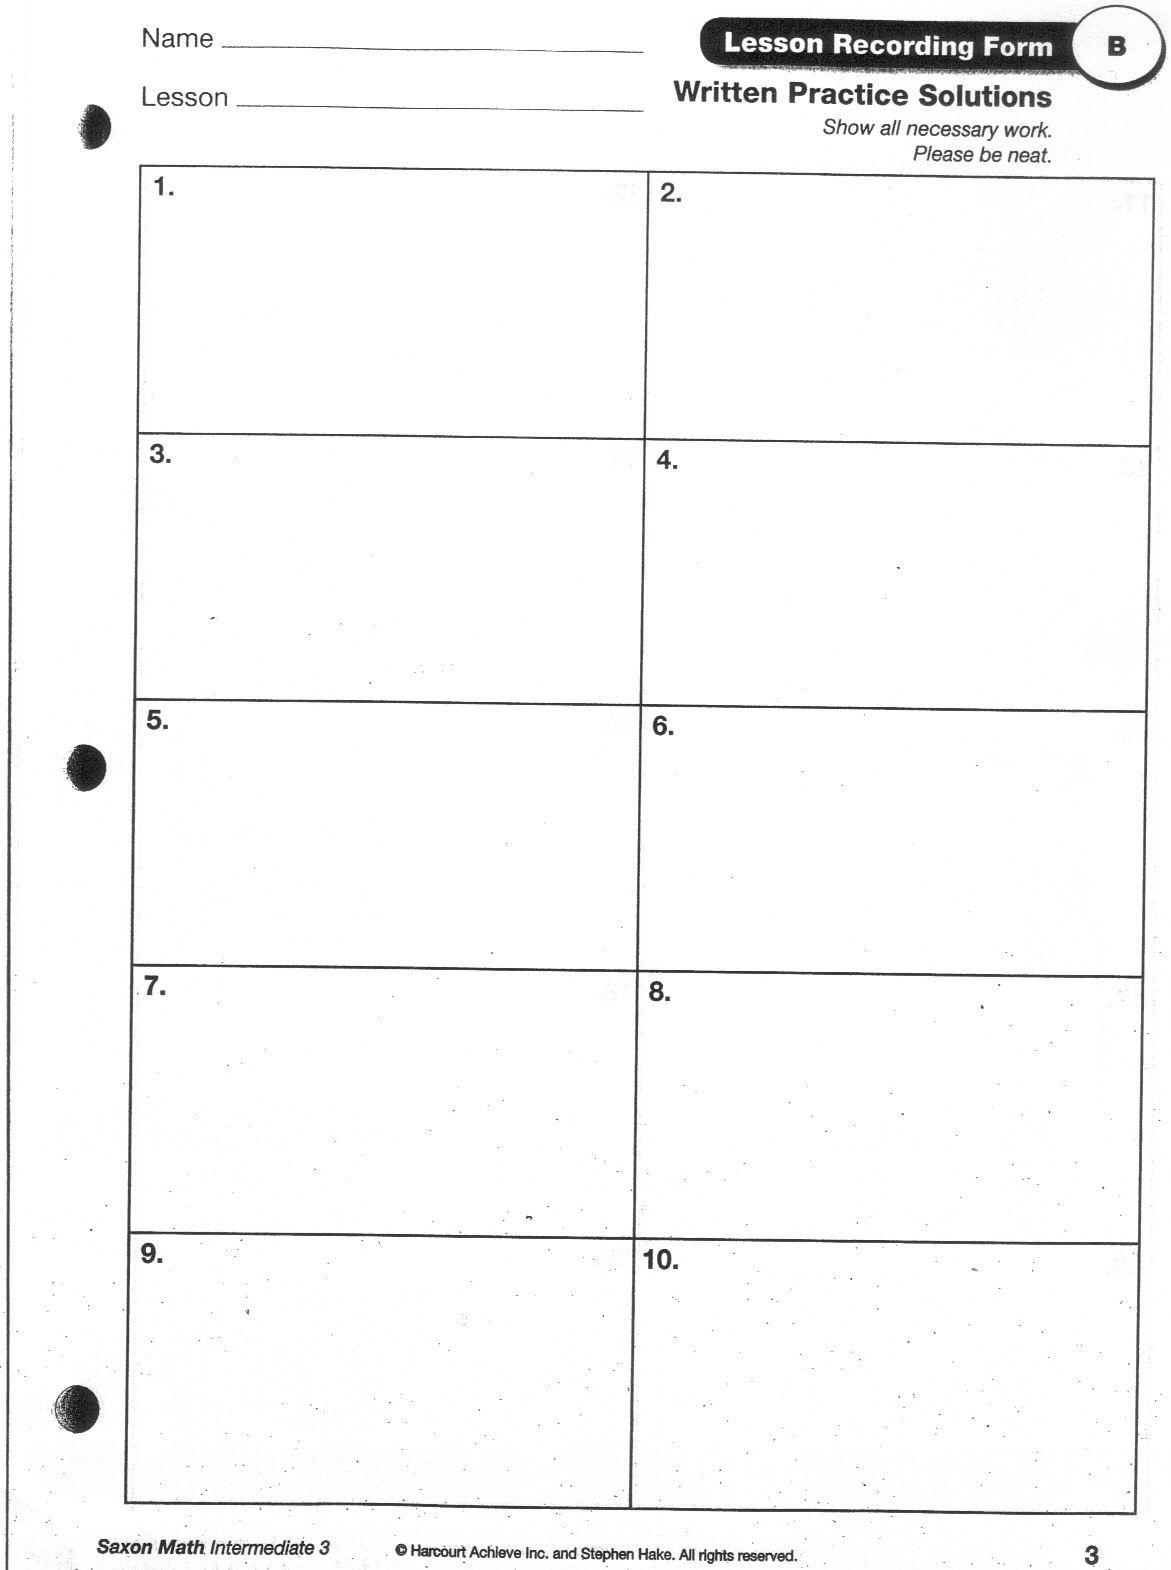 Saxen Math Home Work Sheets 1 20